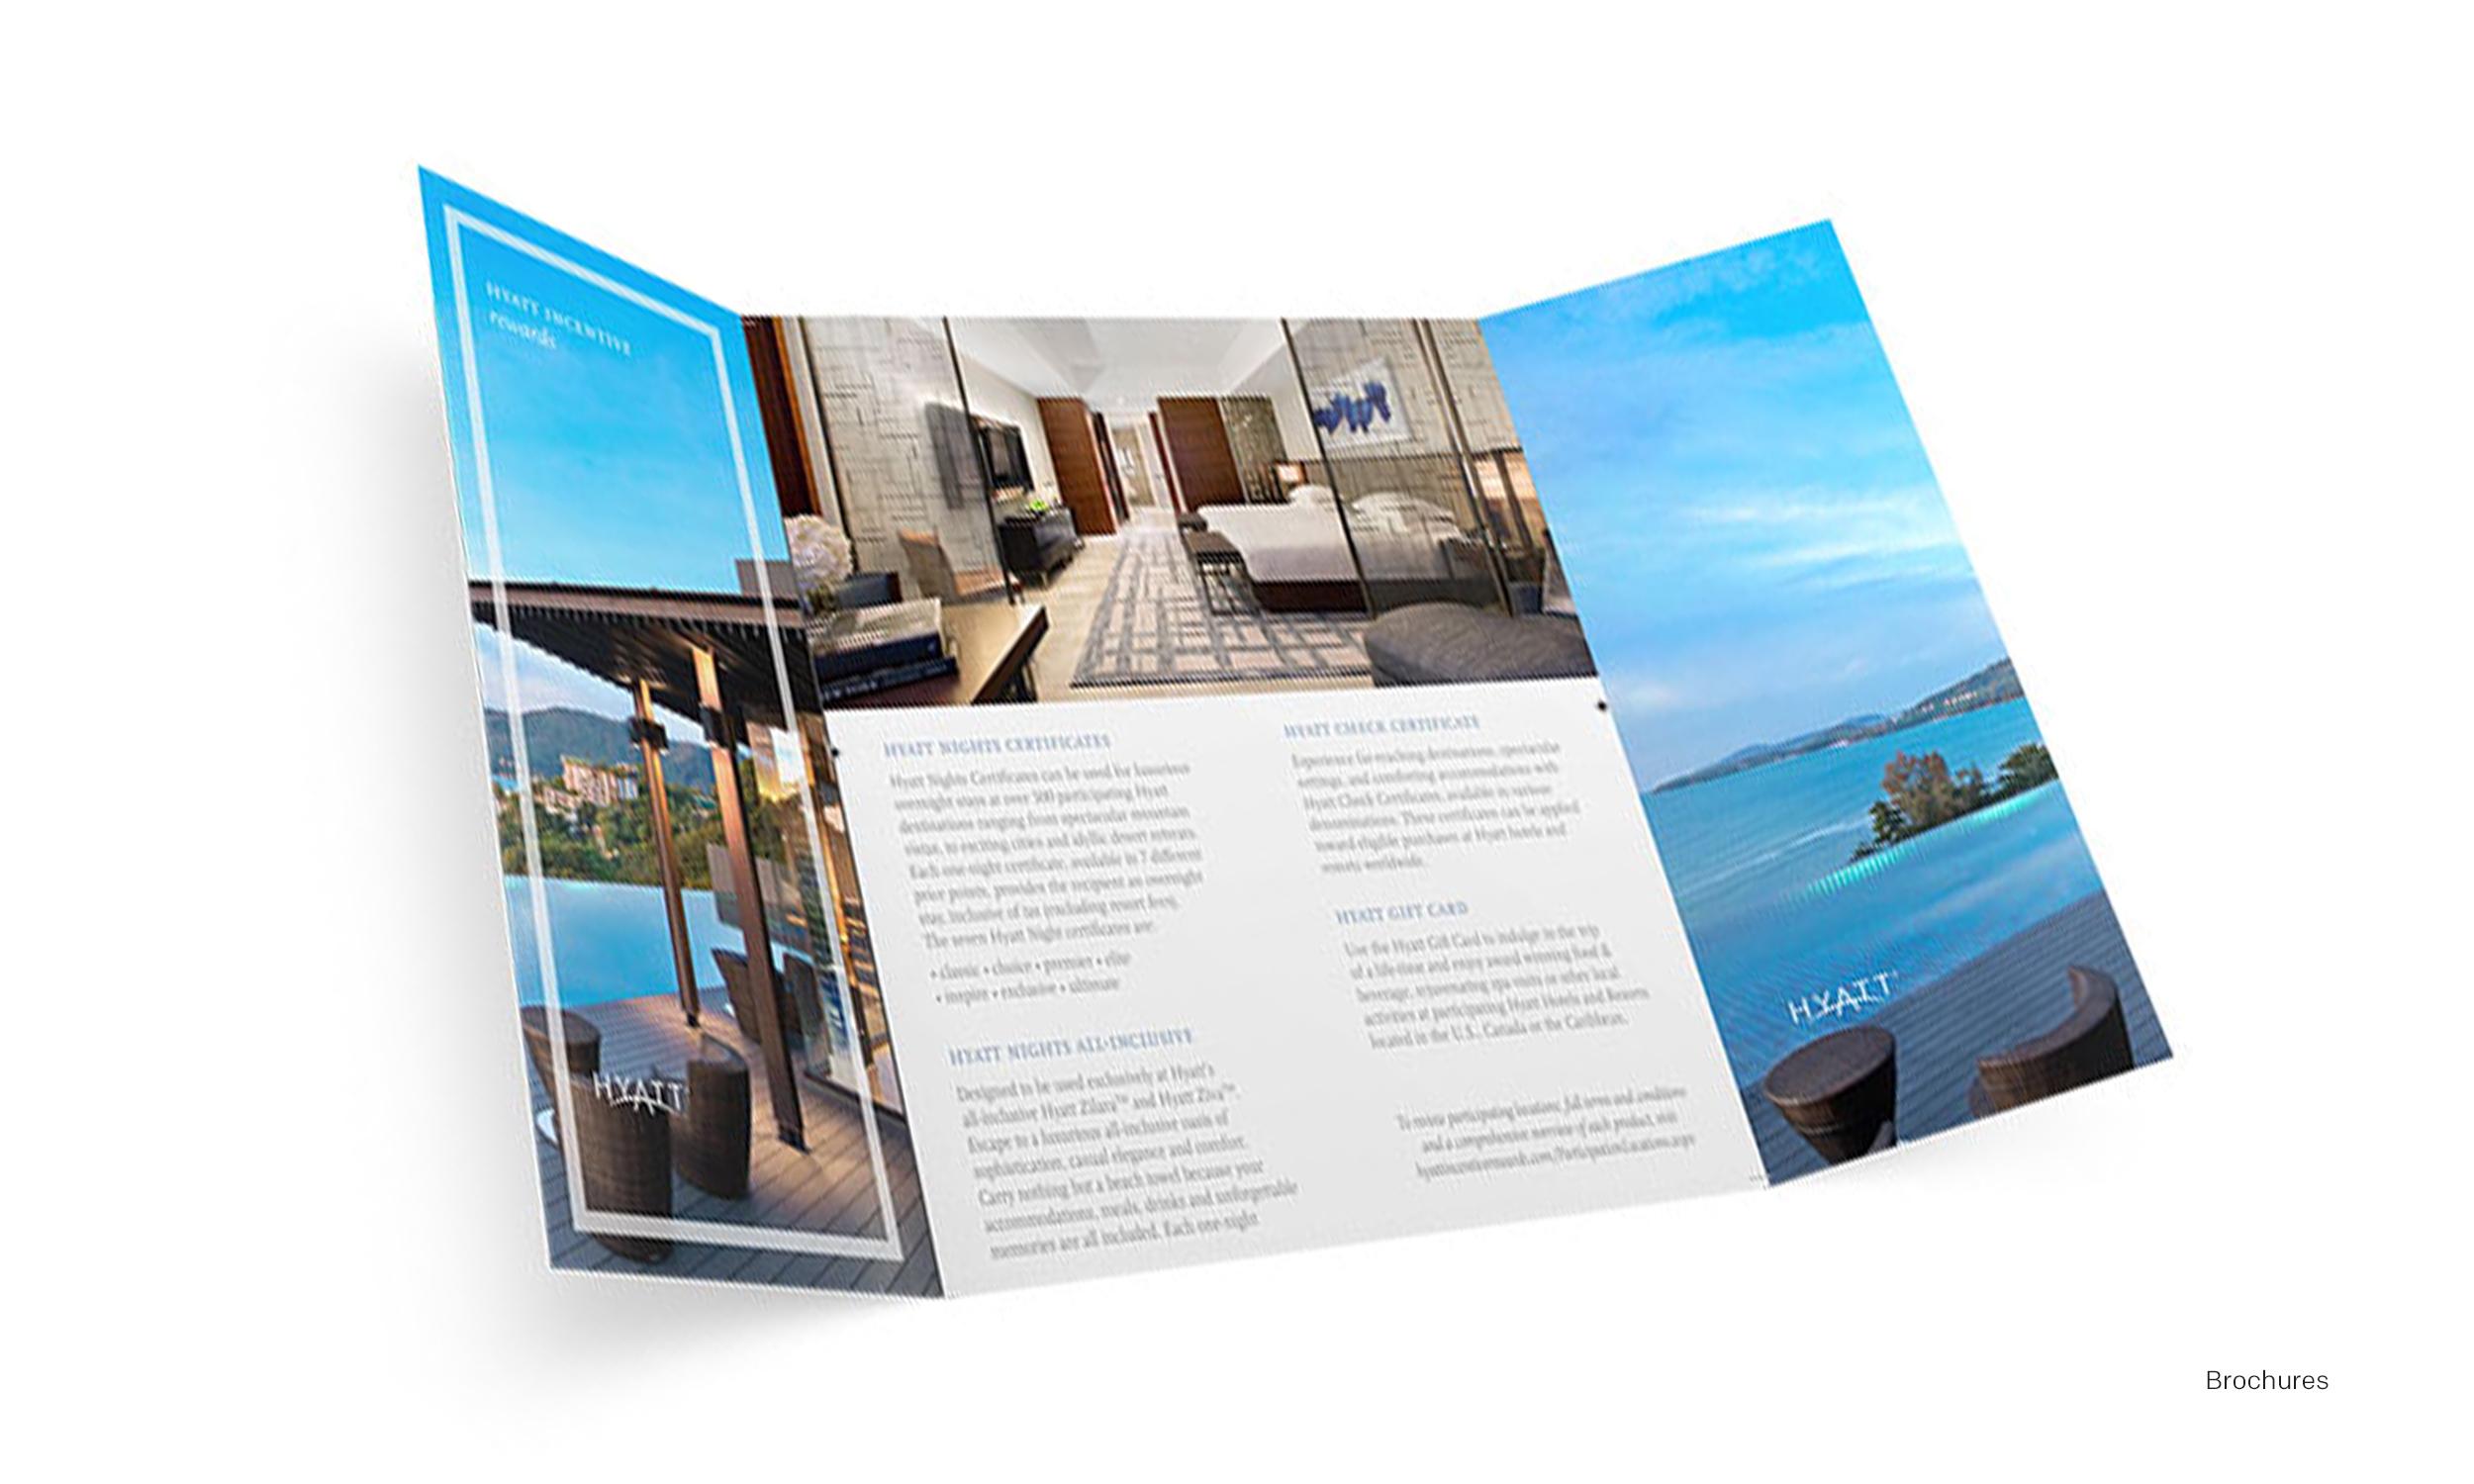 hyatt_brochure_horizontal.jpg